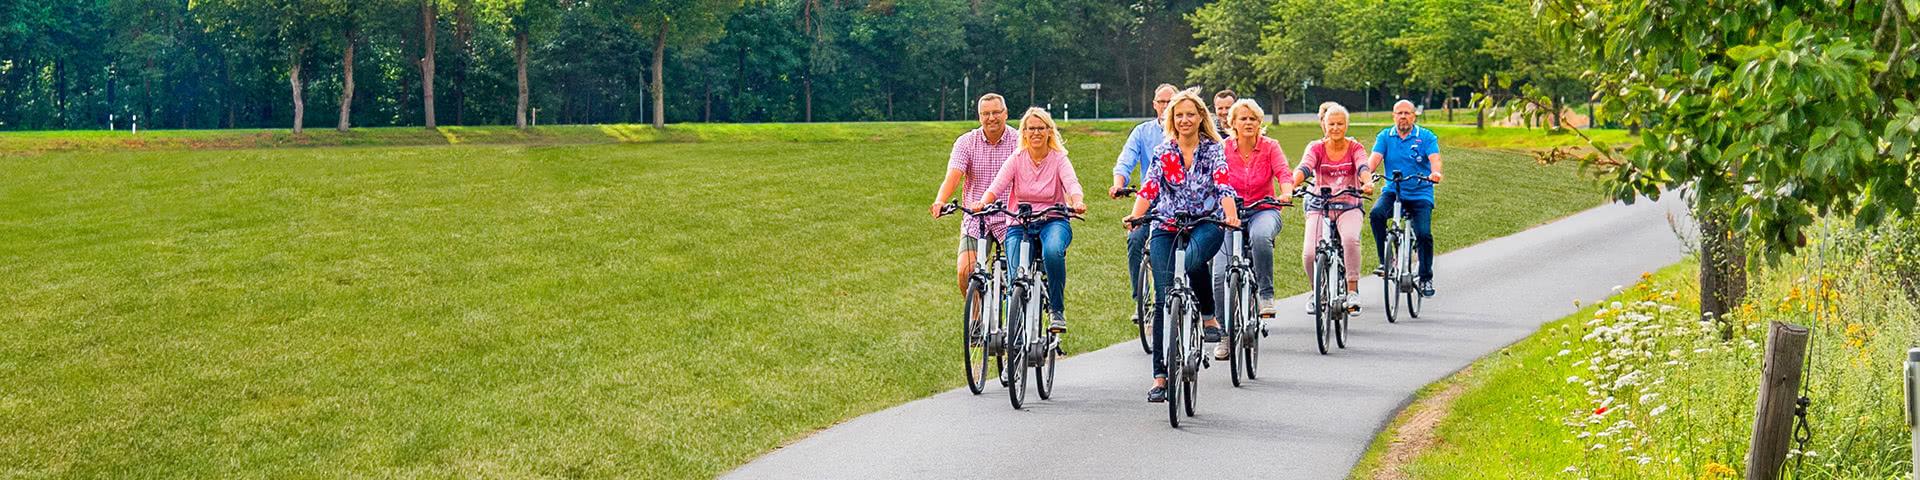 Gruppe macht Radtour vorbei an grünen Wiesen im Hasetal